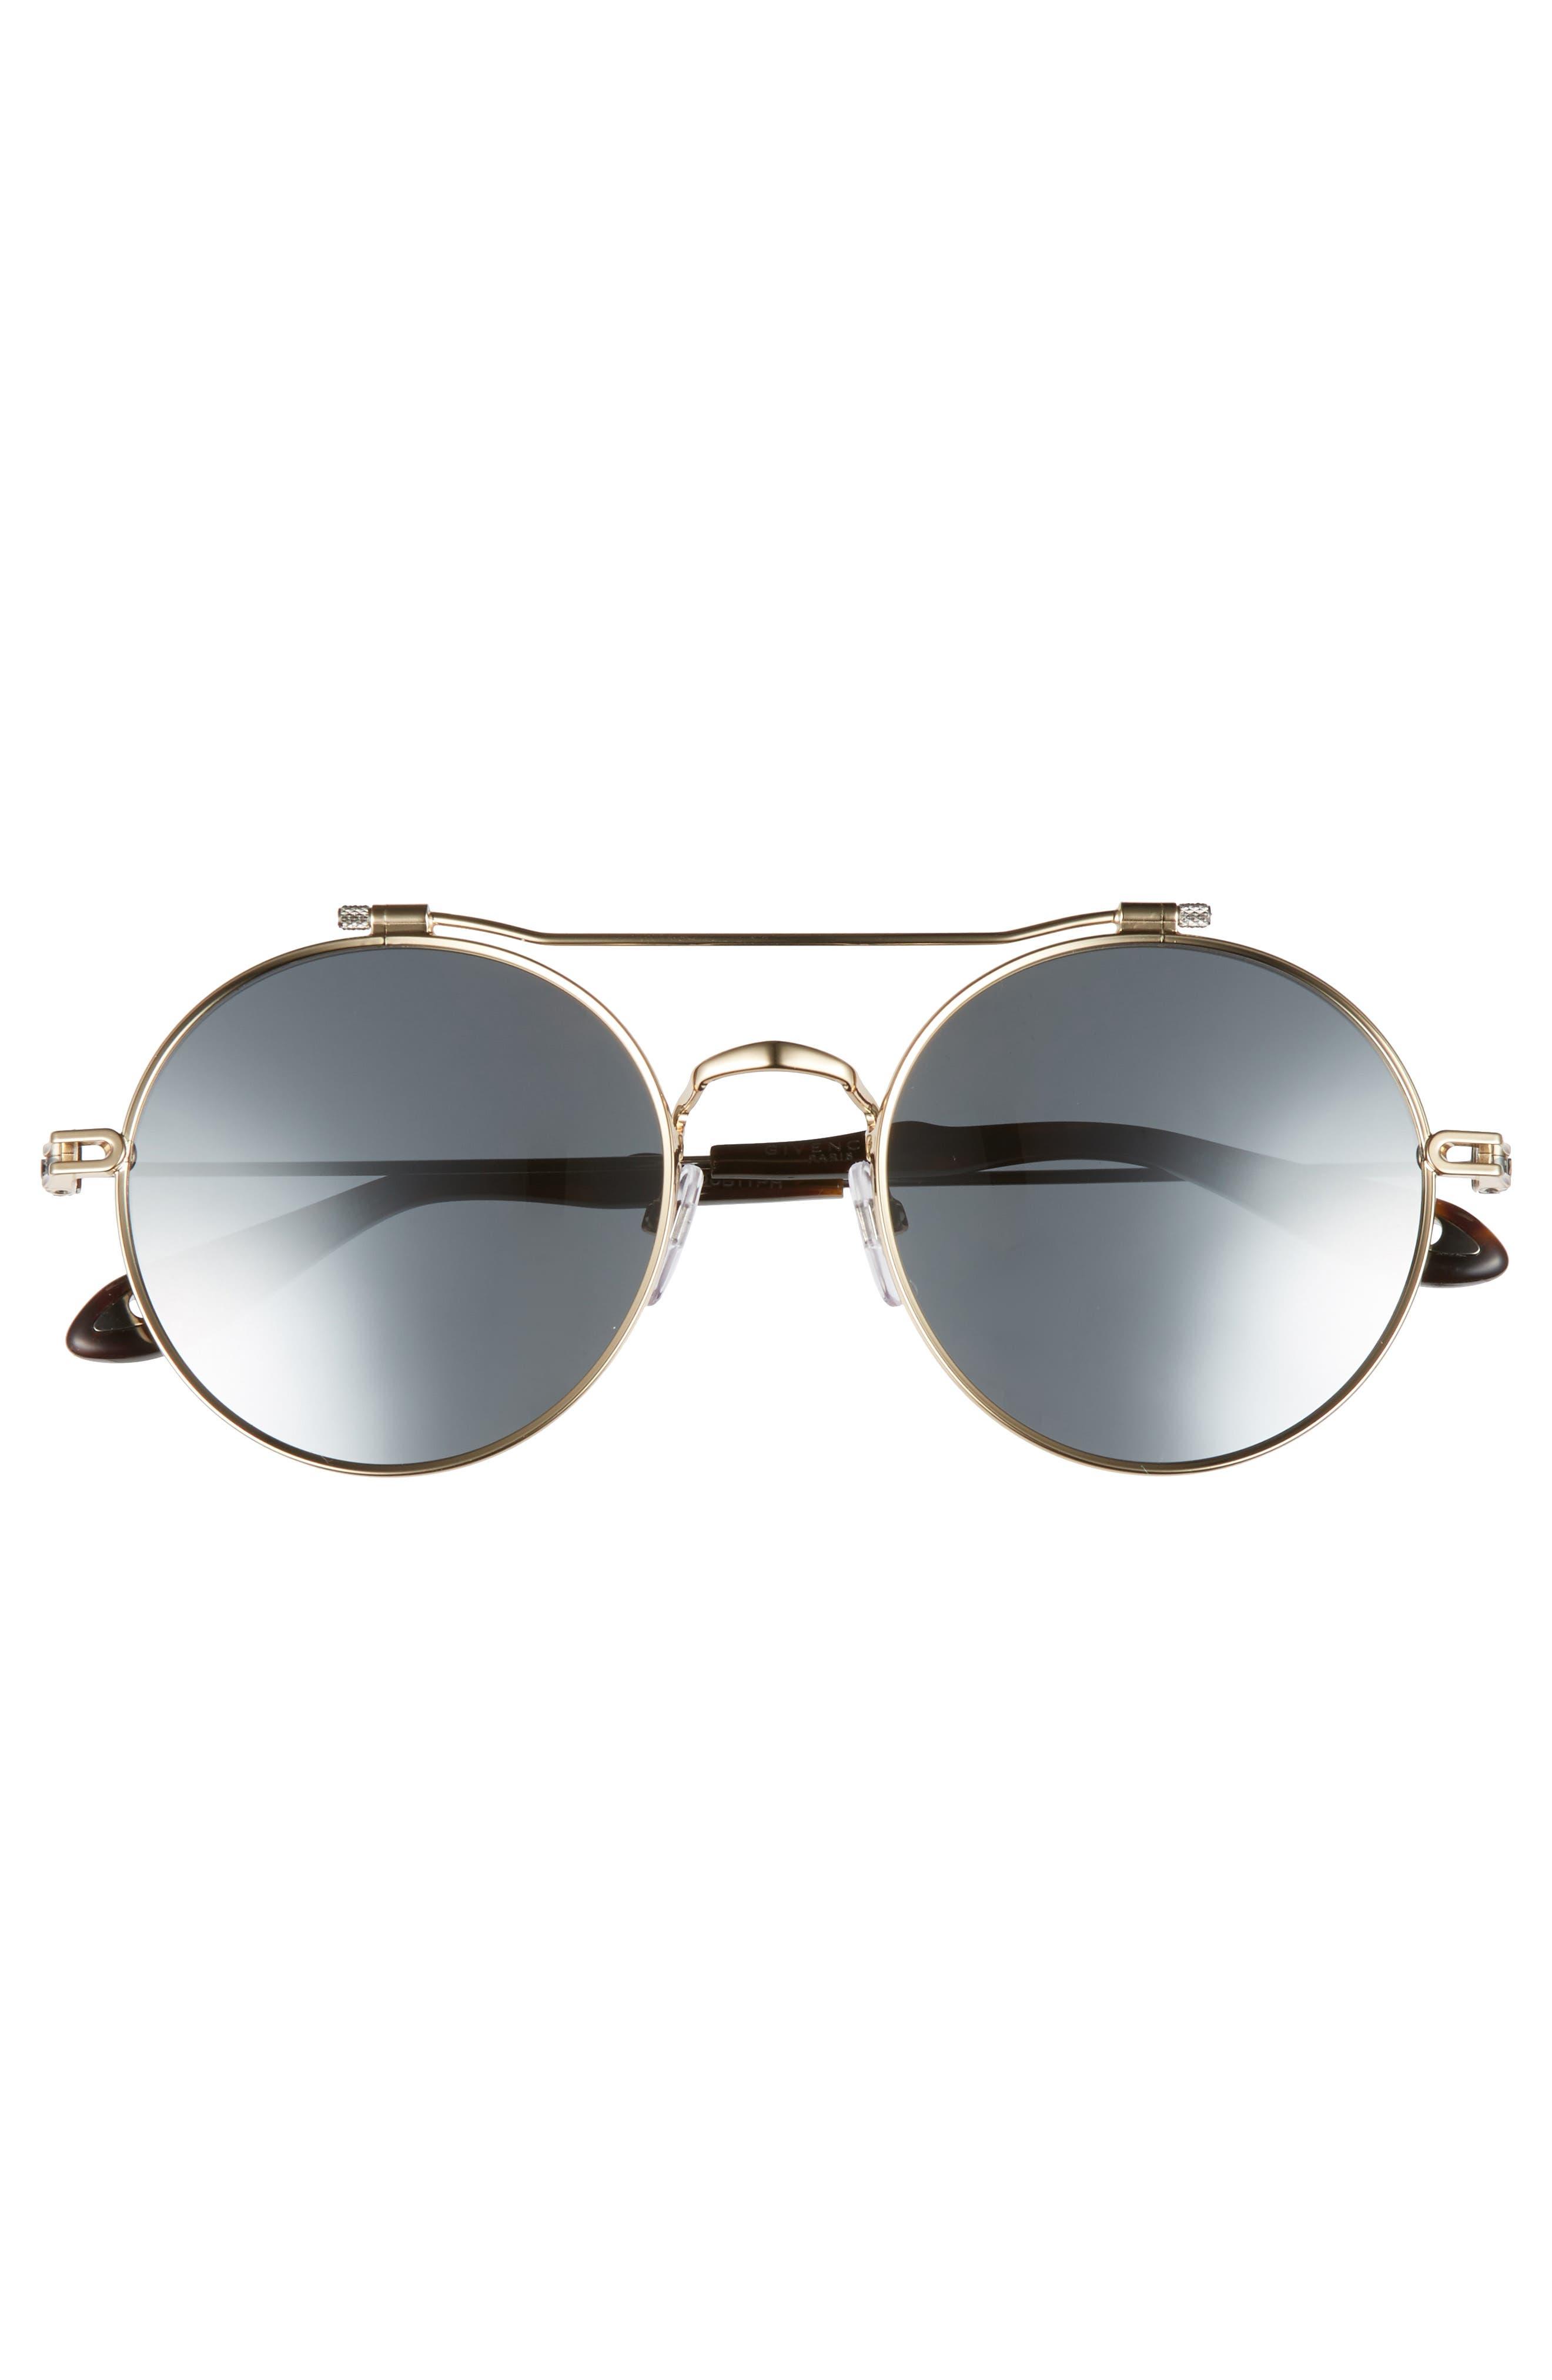 53mm Round Aviator Sunglasses,                             Alternate thumbnail 2, color,                             Gold Ruthenium/ Black Mirror